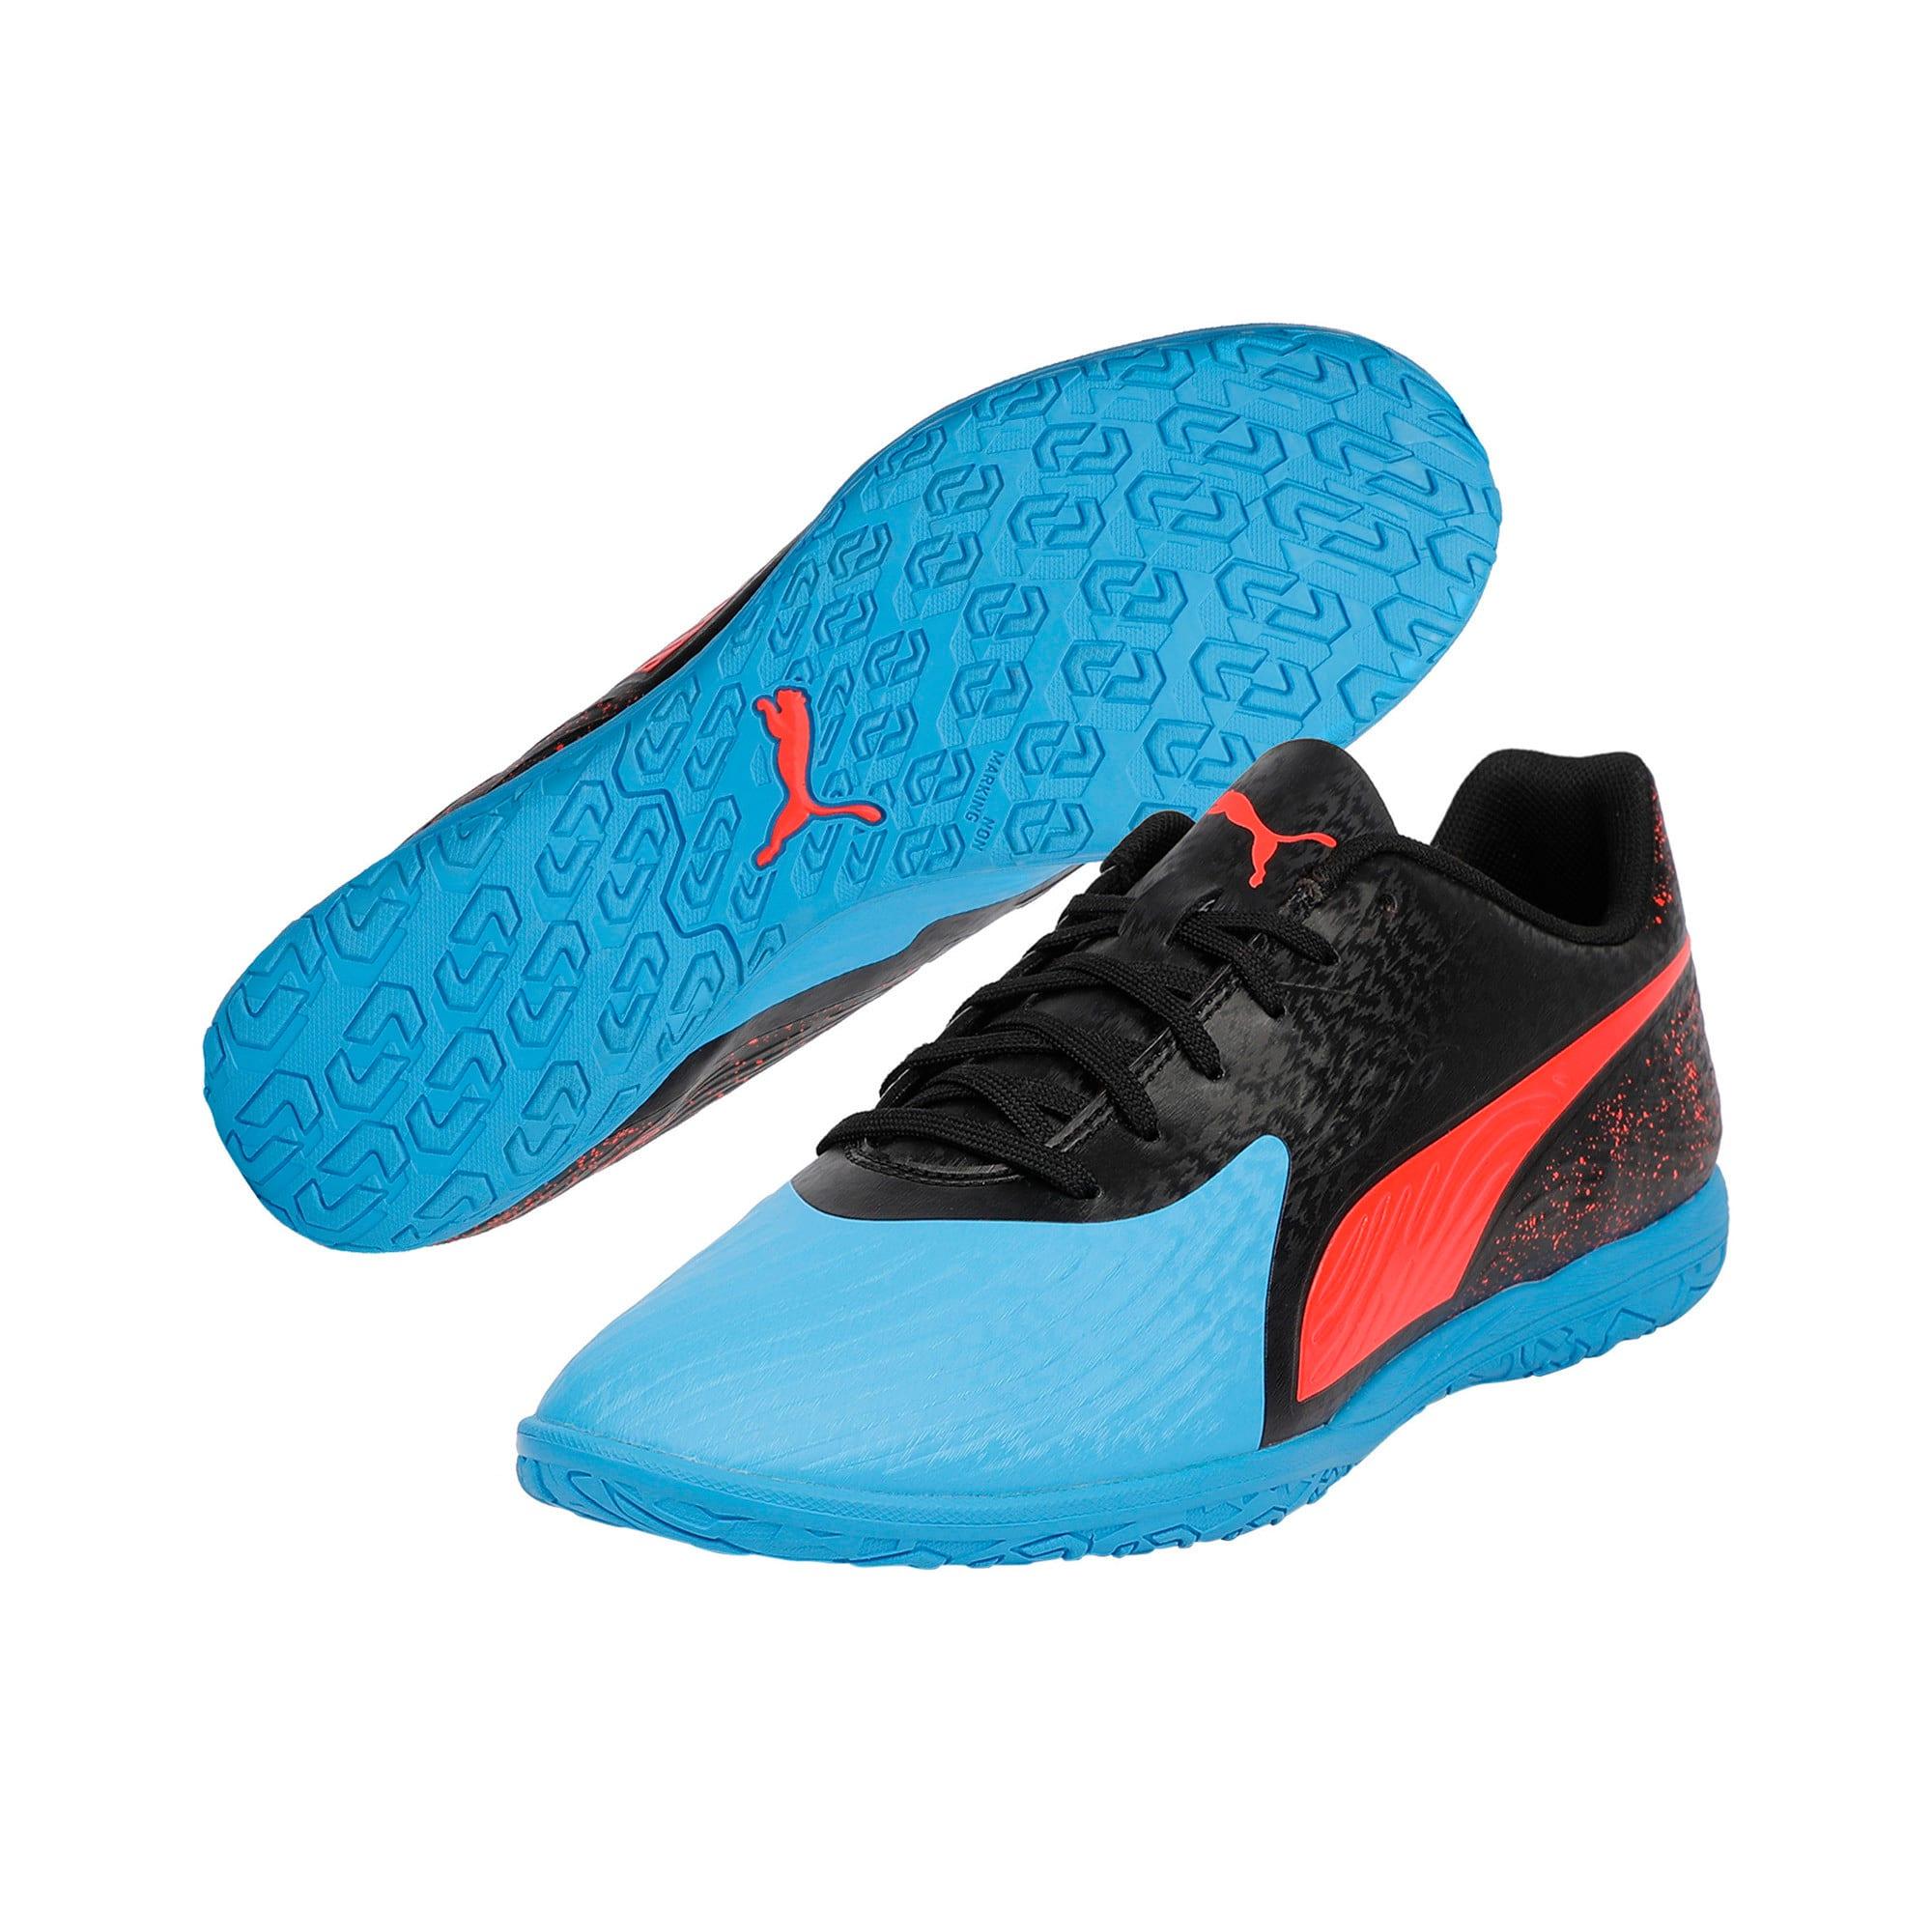 Thumbnail 4 of PUMA ONE 19.4 IT Men's Football Boots, Bleu Azur-Red Blast-Black, medium-IND